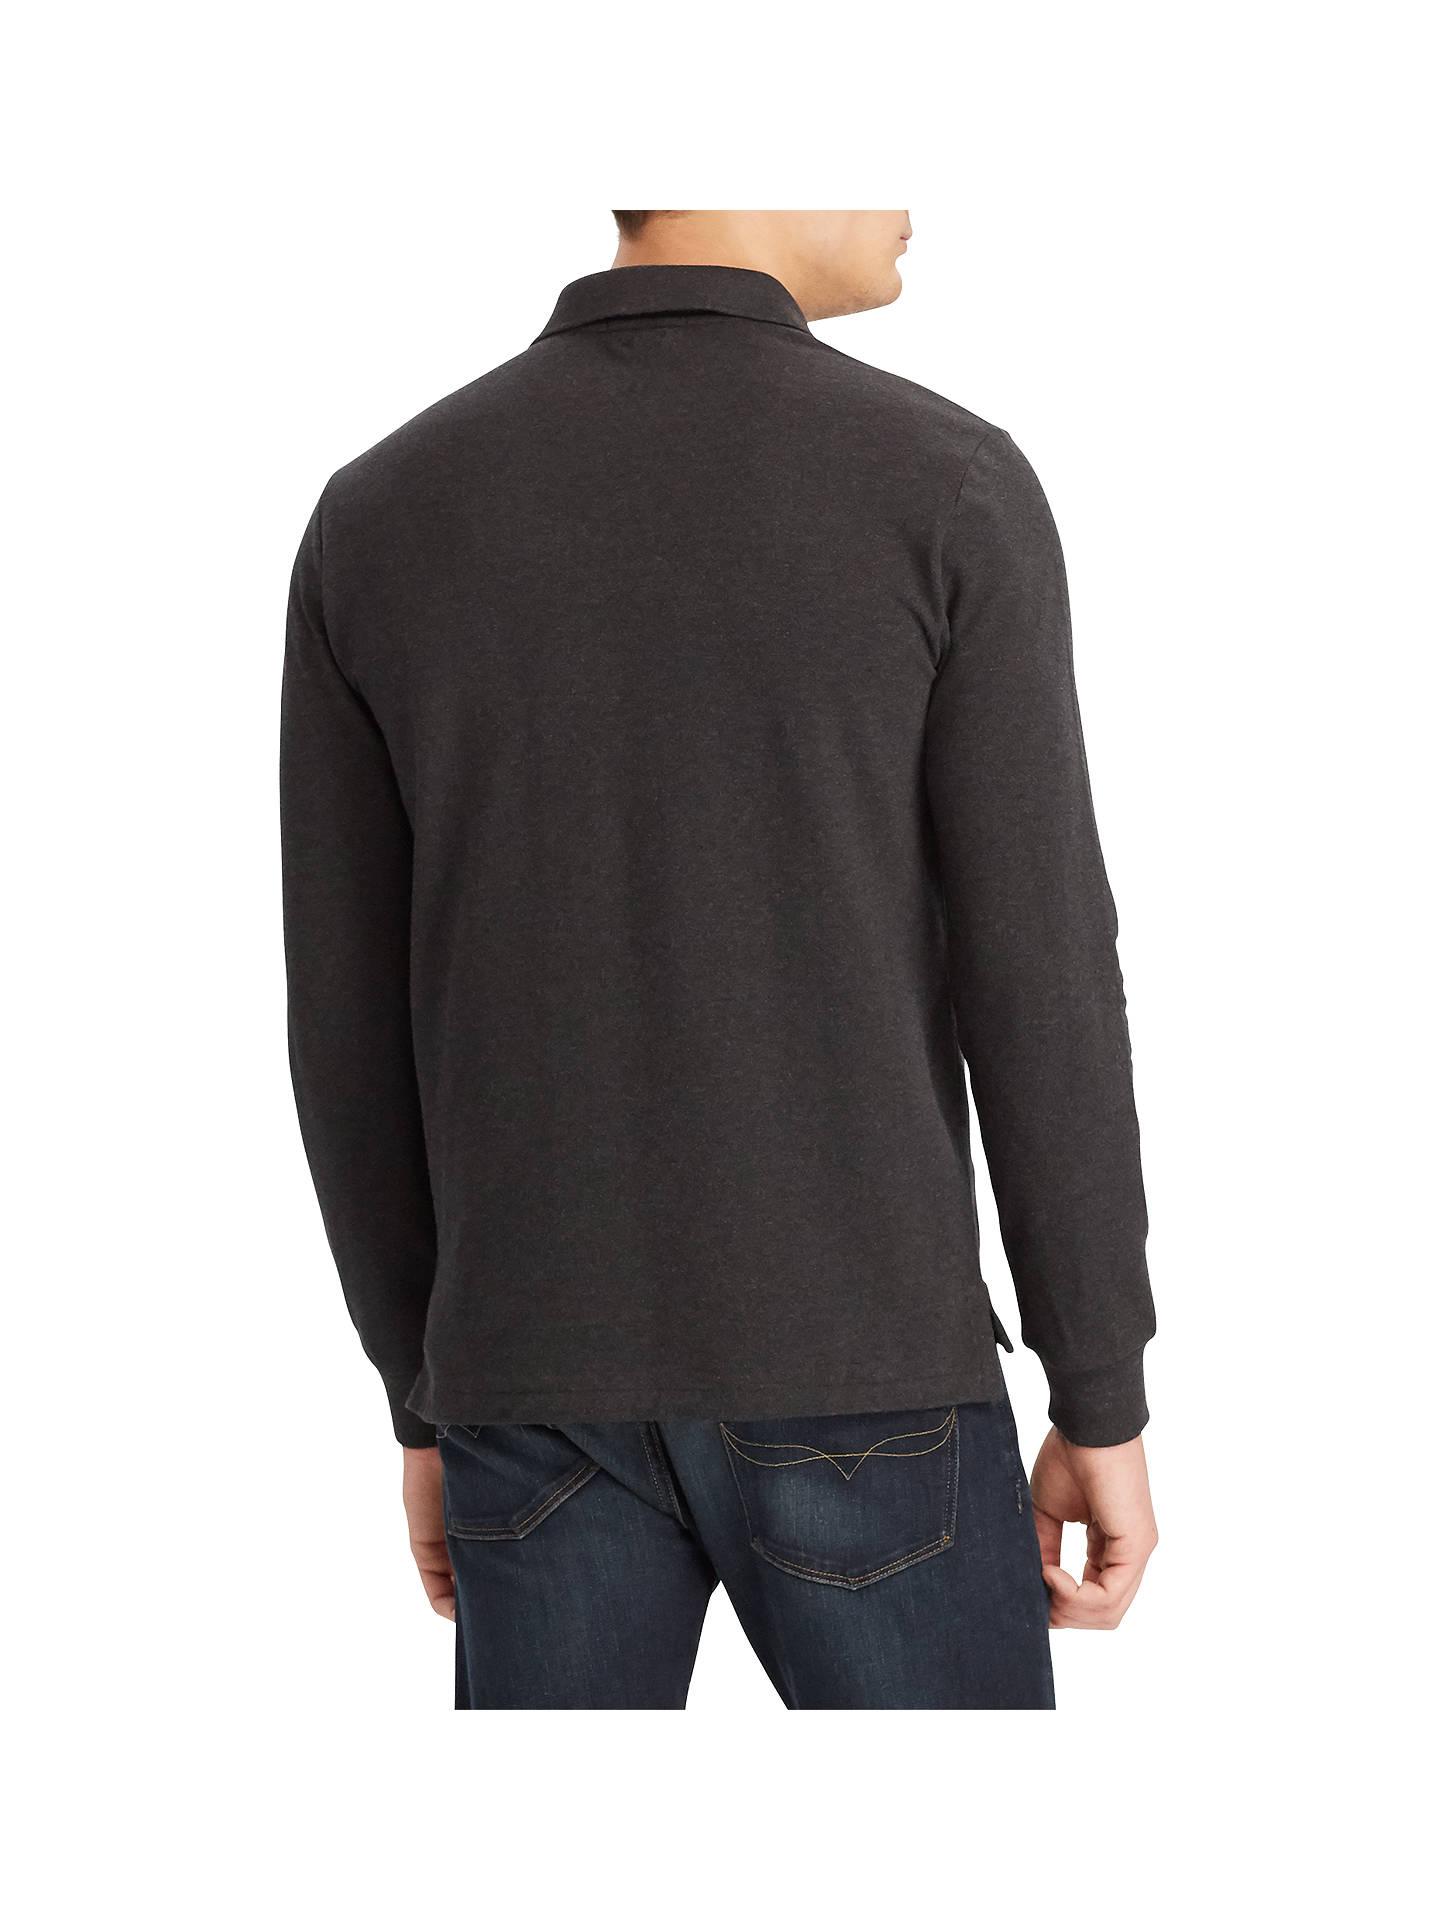 23e4ef33 Polo Ralph Lauren Long Sleeve Pima Mesh Polo Shirt, Dark Granite ...